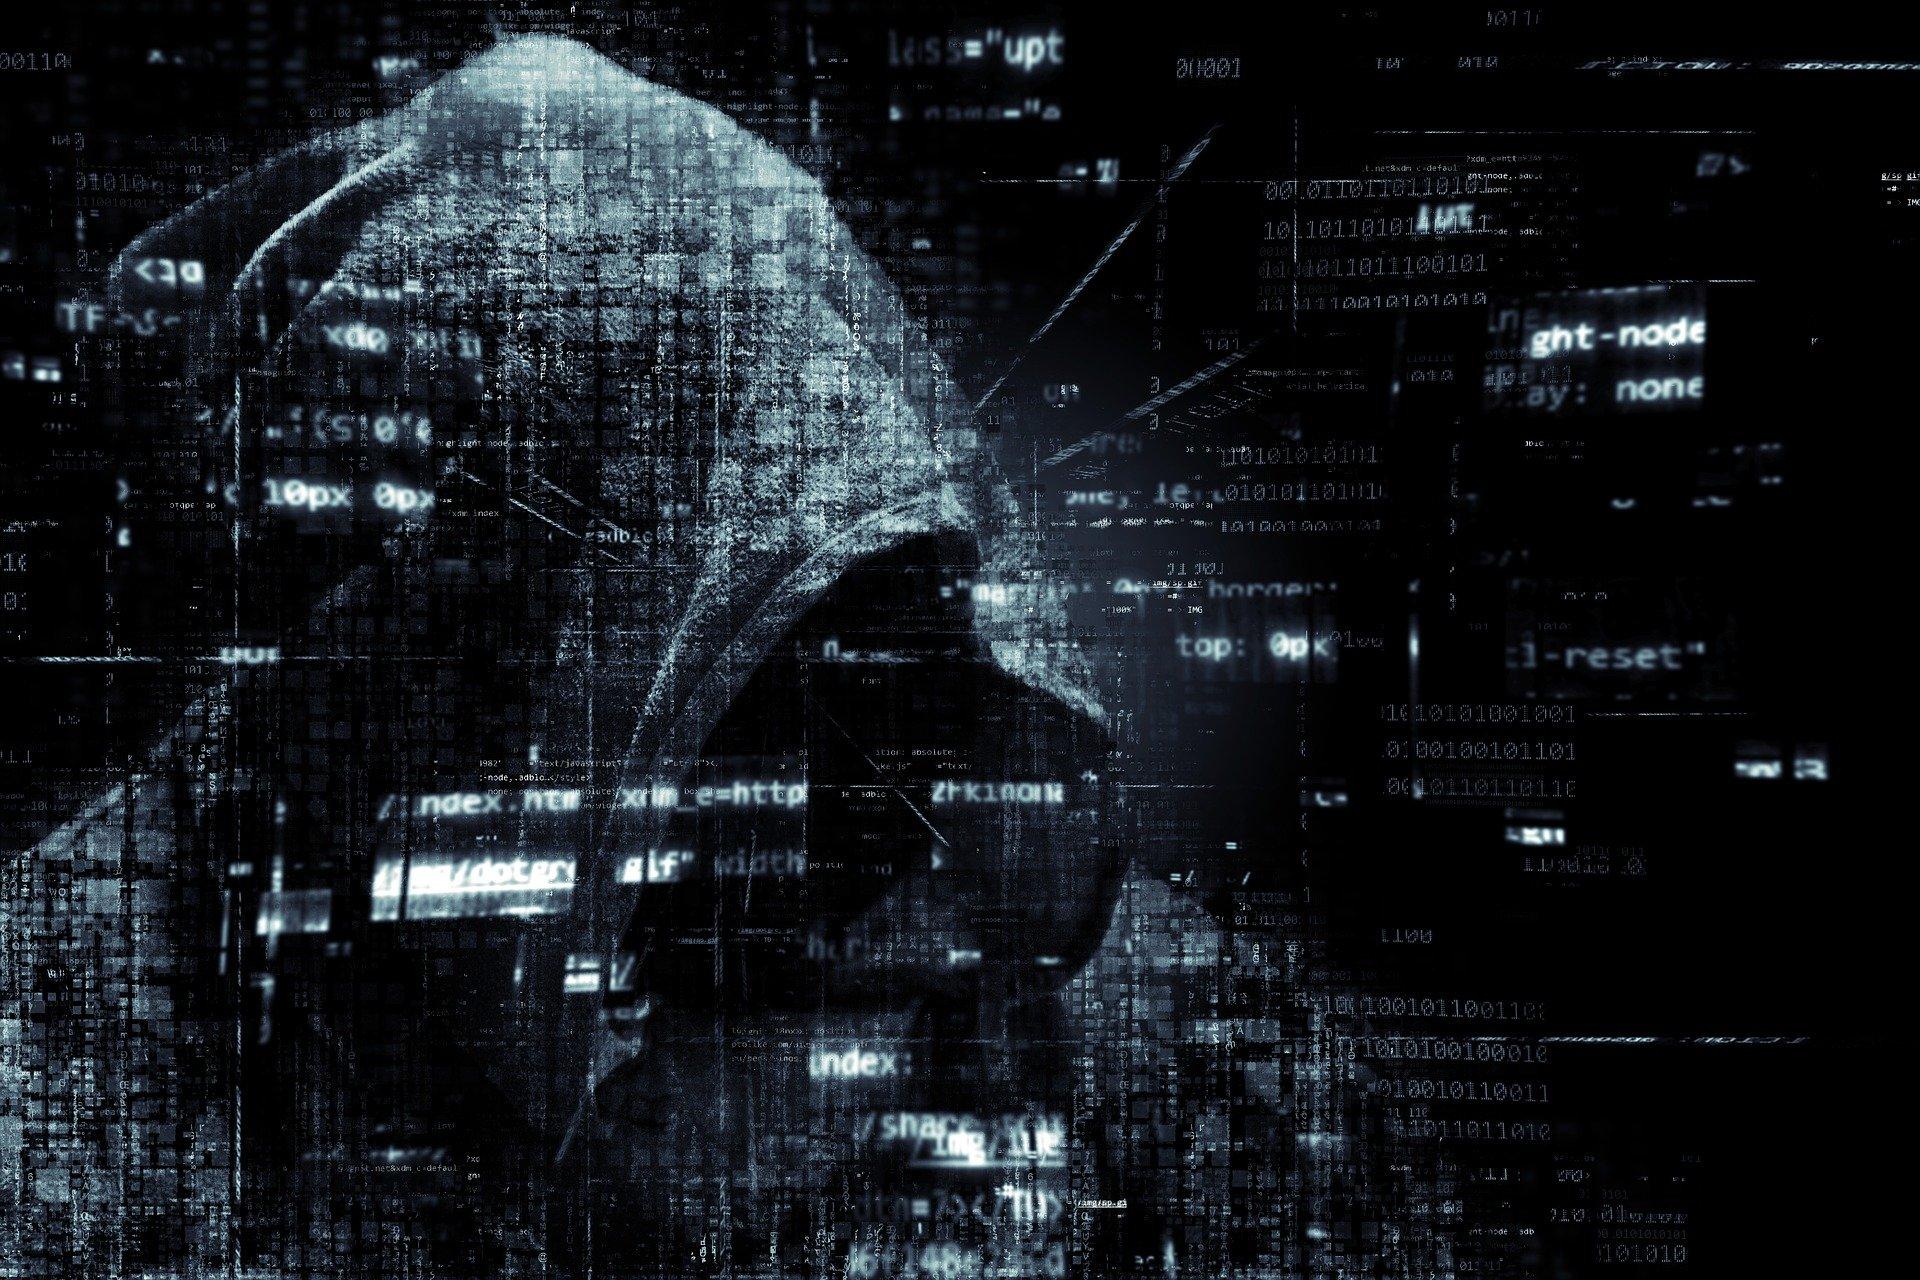 Darkside Hacking Group Reveals Dangerous Evolution